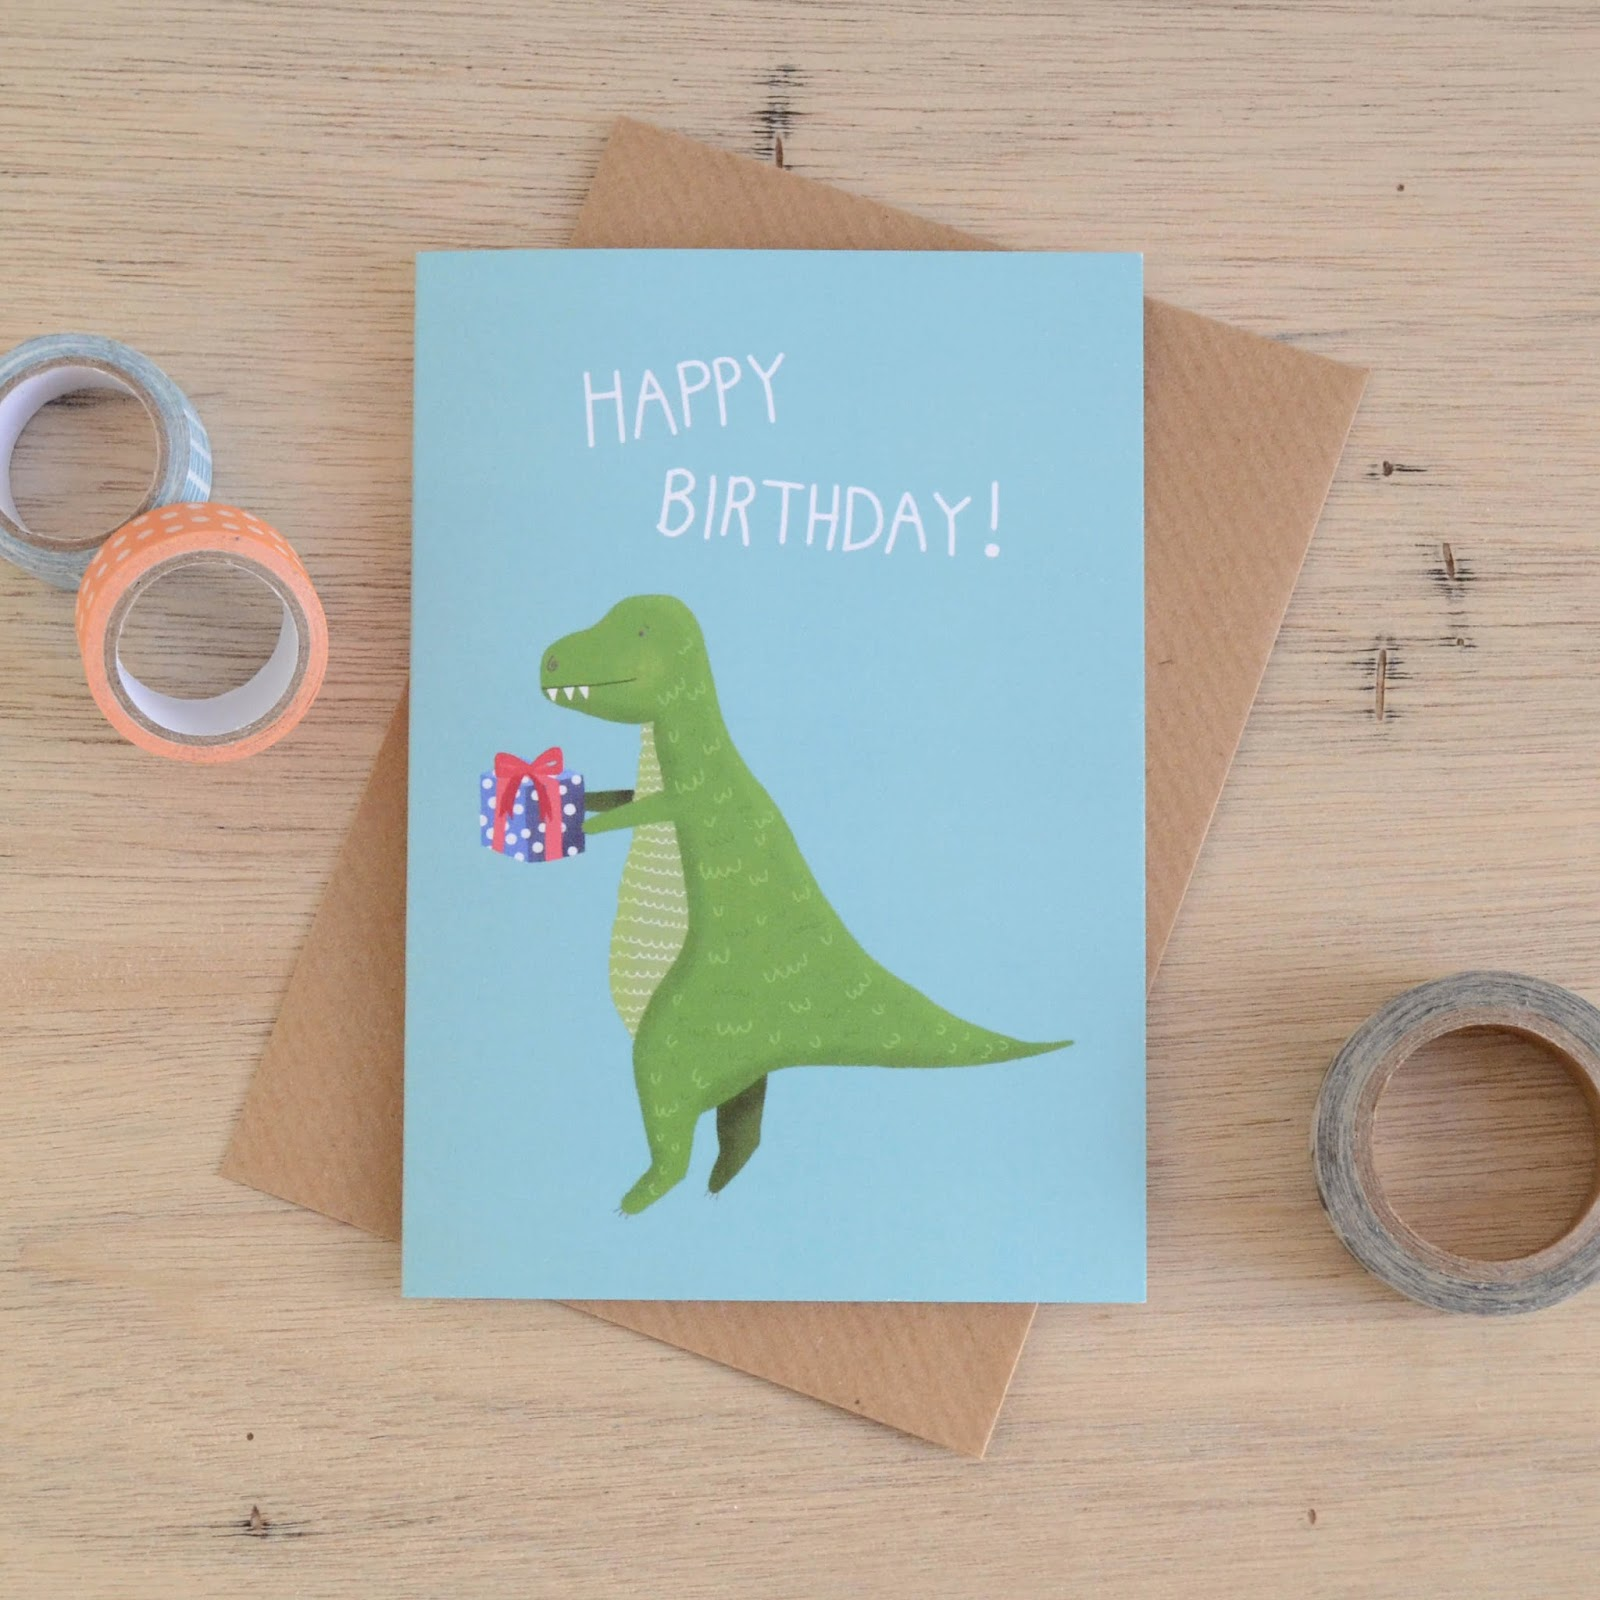 http://folksy.com/items/5725591-T-Rex-Birthday-Card